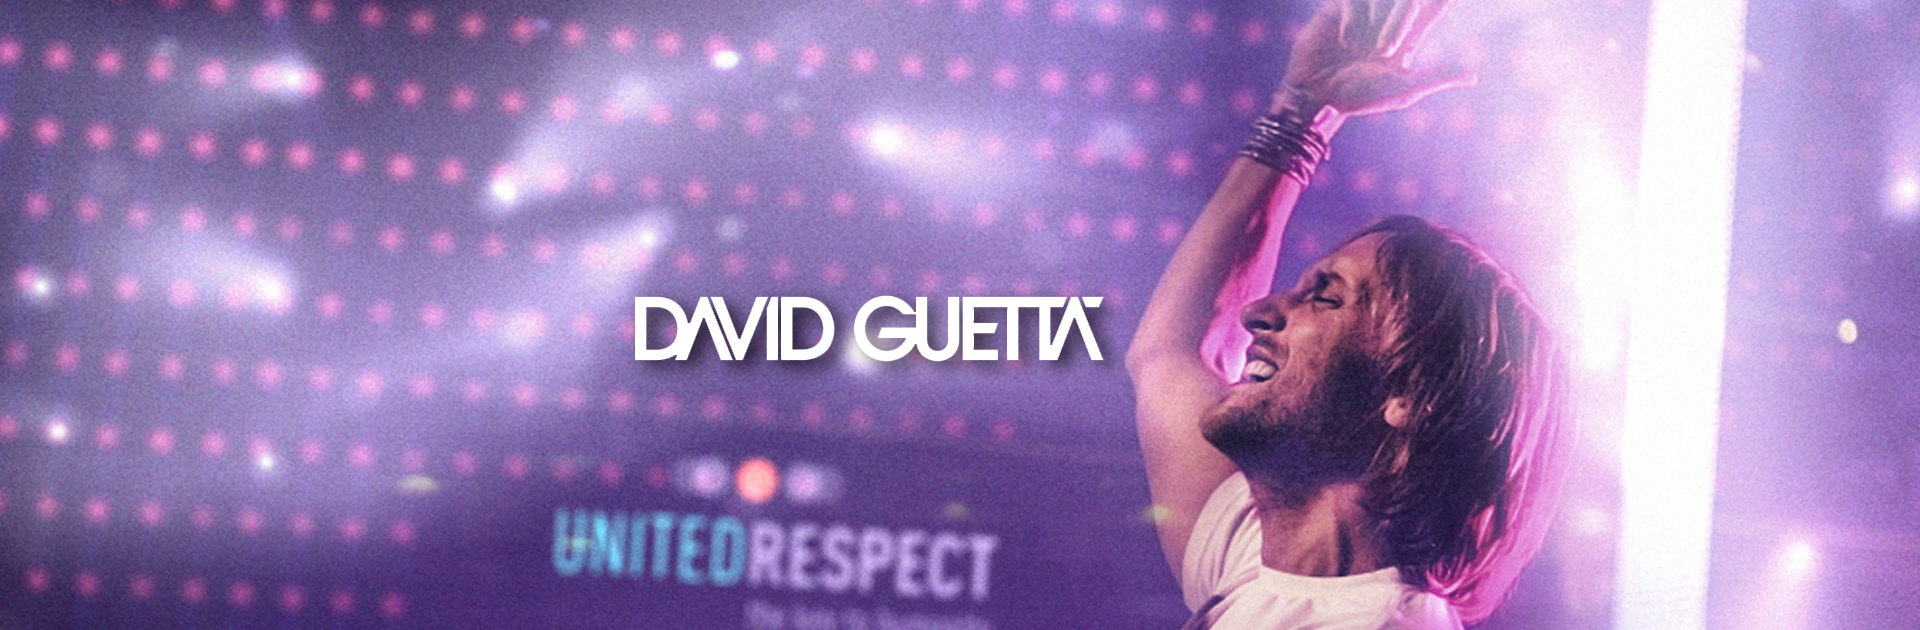 Guetta Kopie.jpg